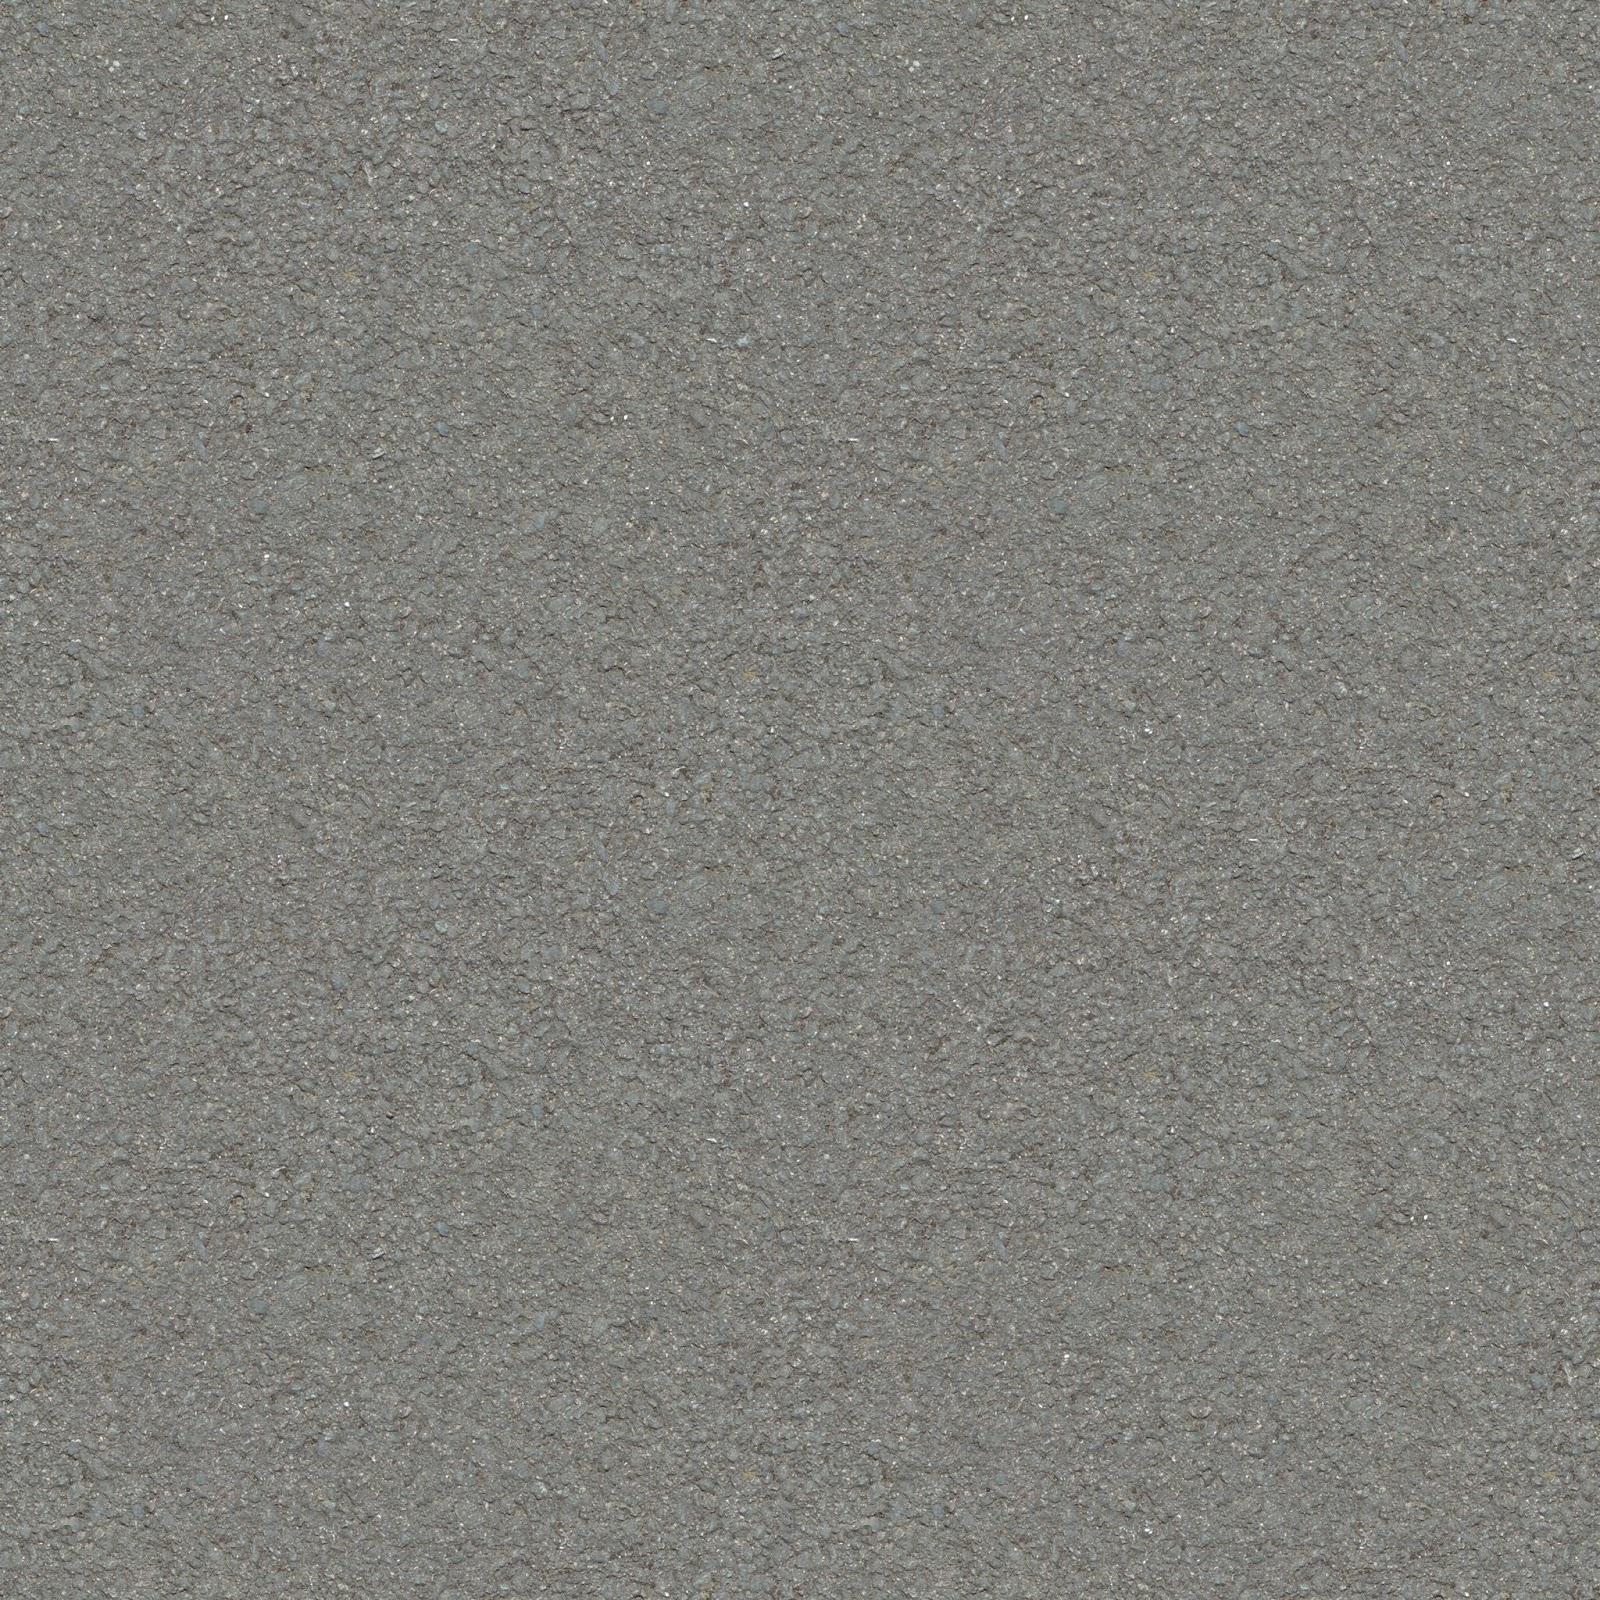 High Resolution Seamless Textures Asphalt 1 Tarmac Road